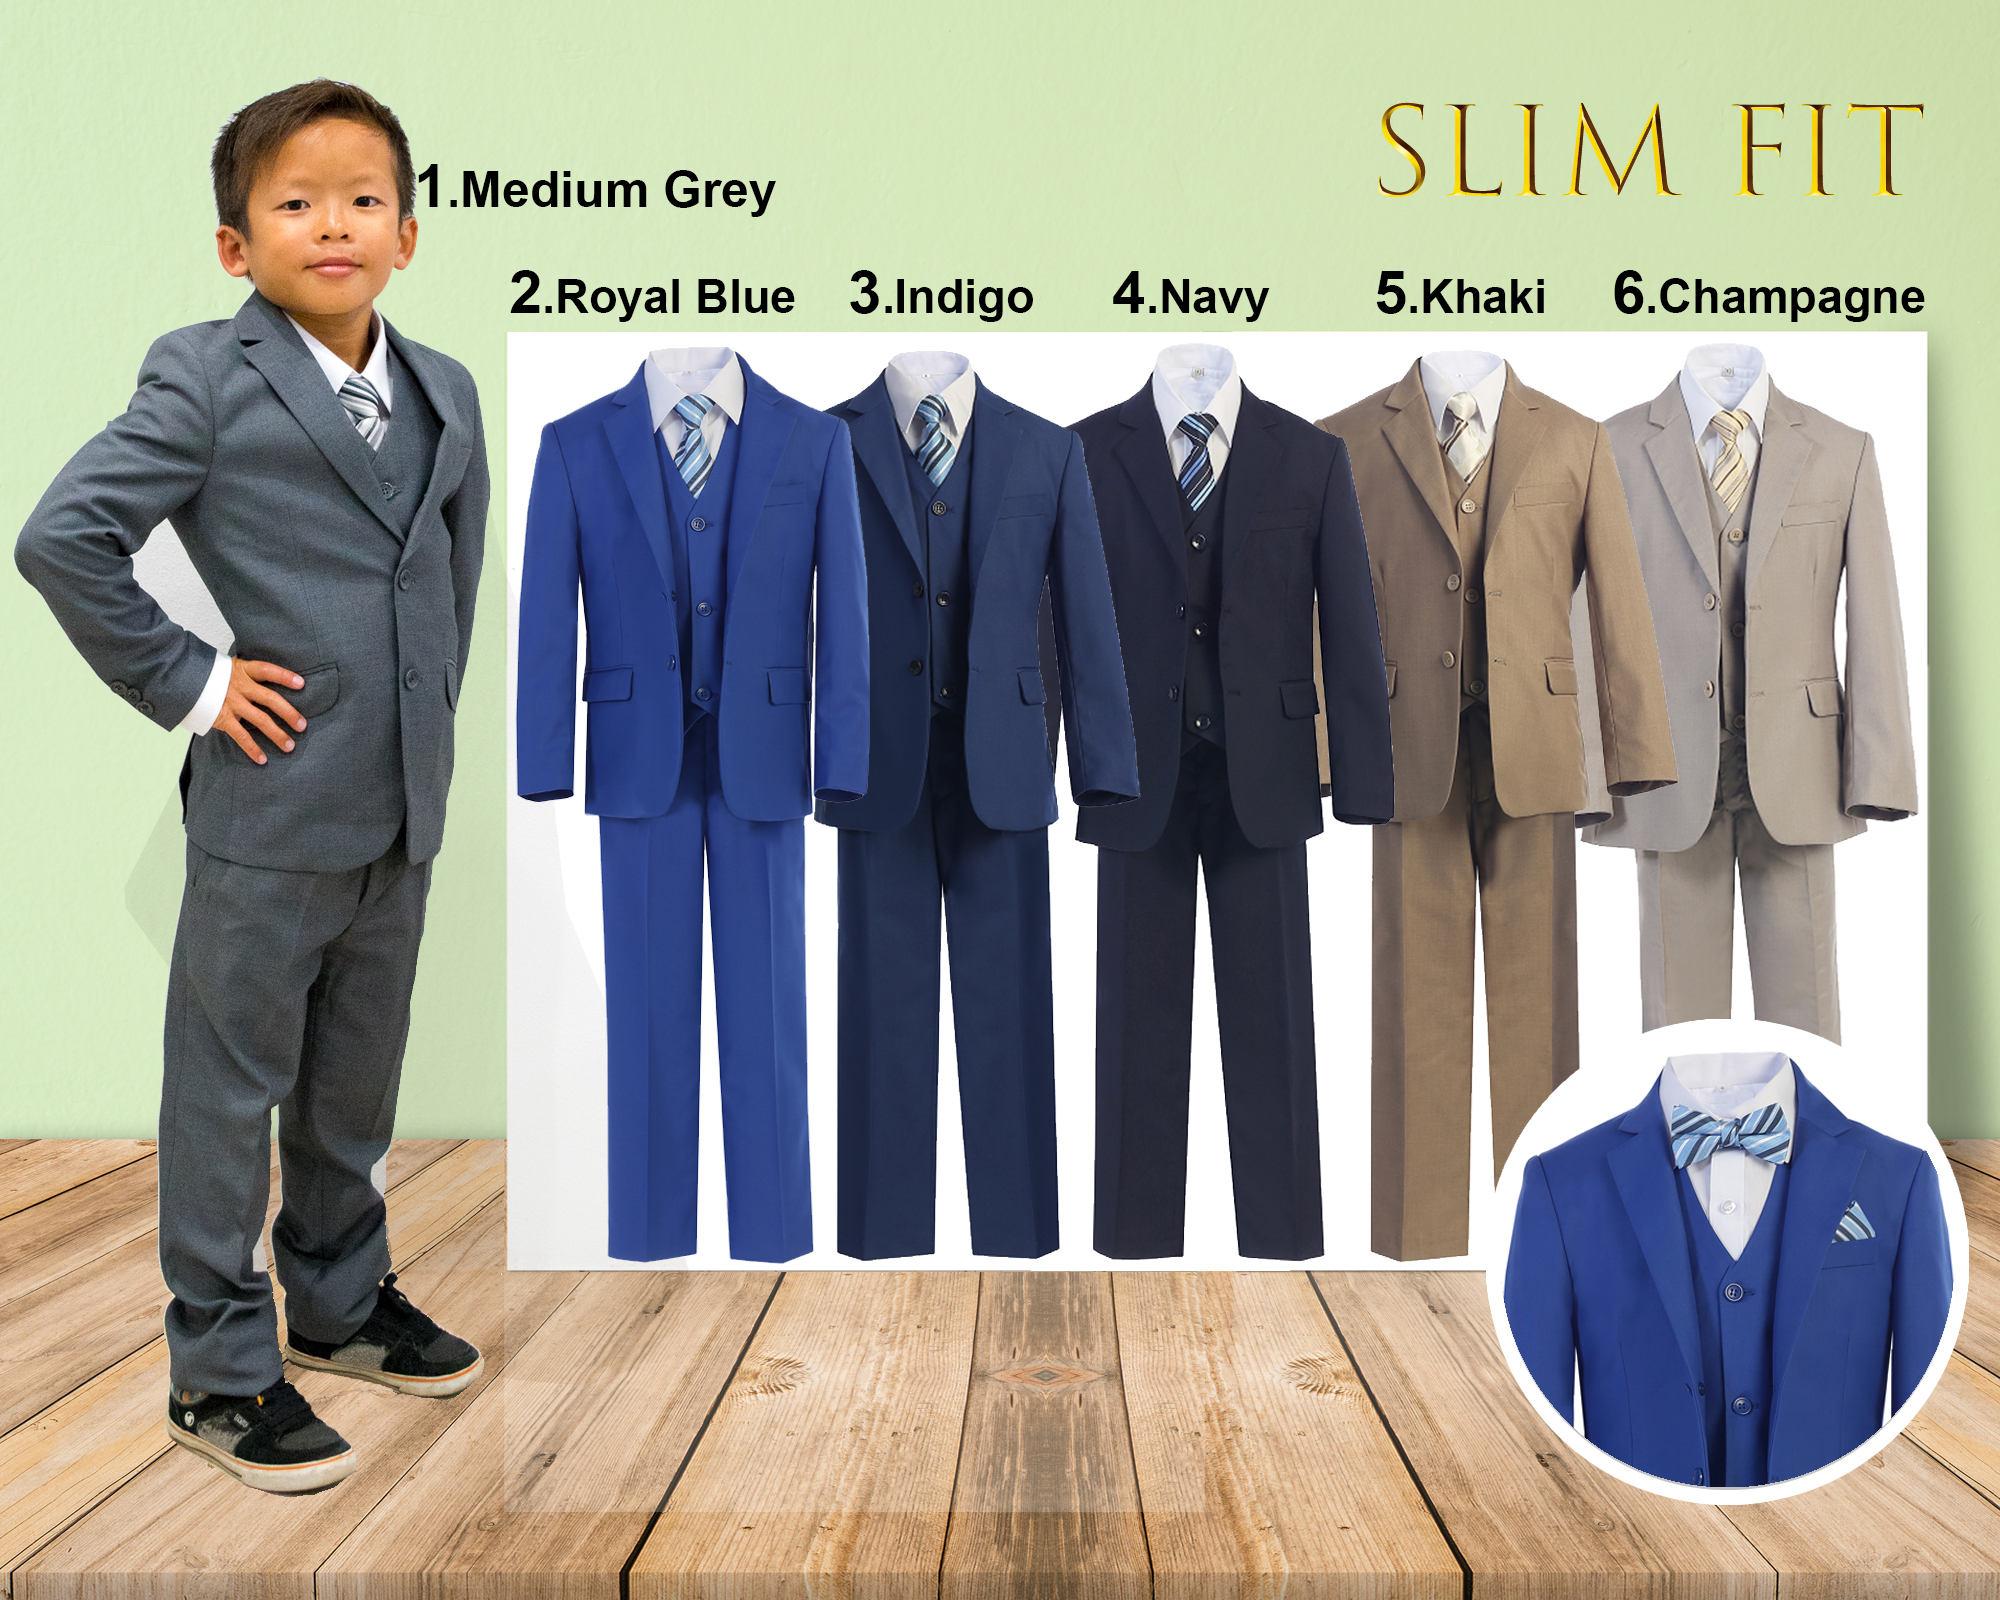 b5f6689b4150b Slim Fit Premium Boys 7-Piece Suit Tuxedo, Gray Navy Indigo Royal ...